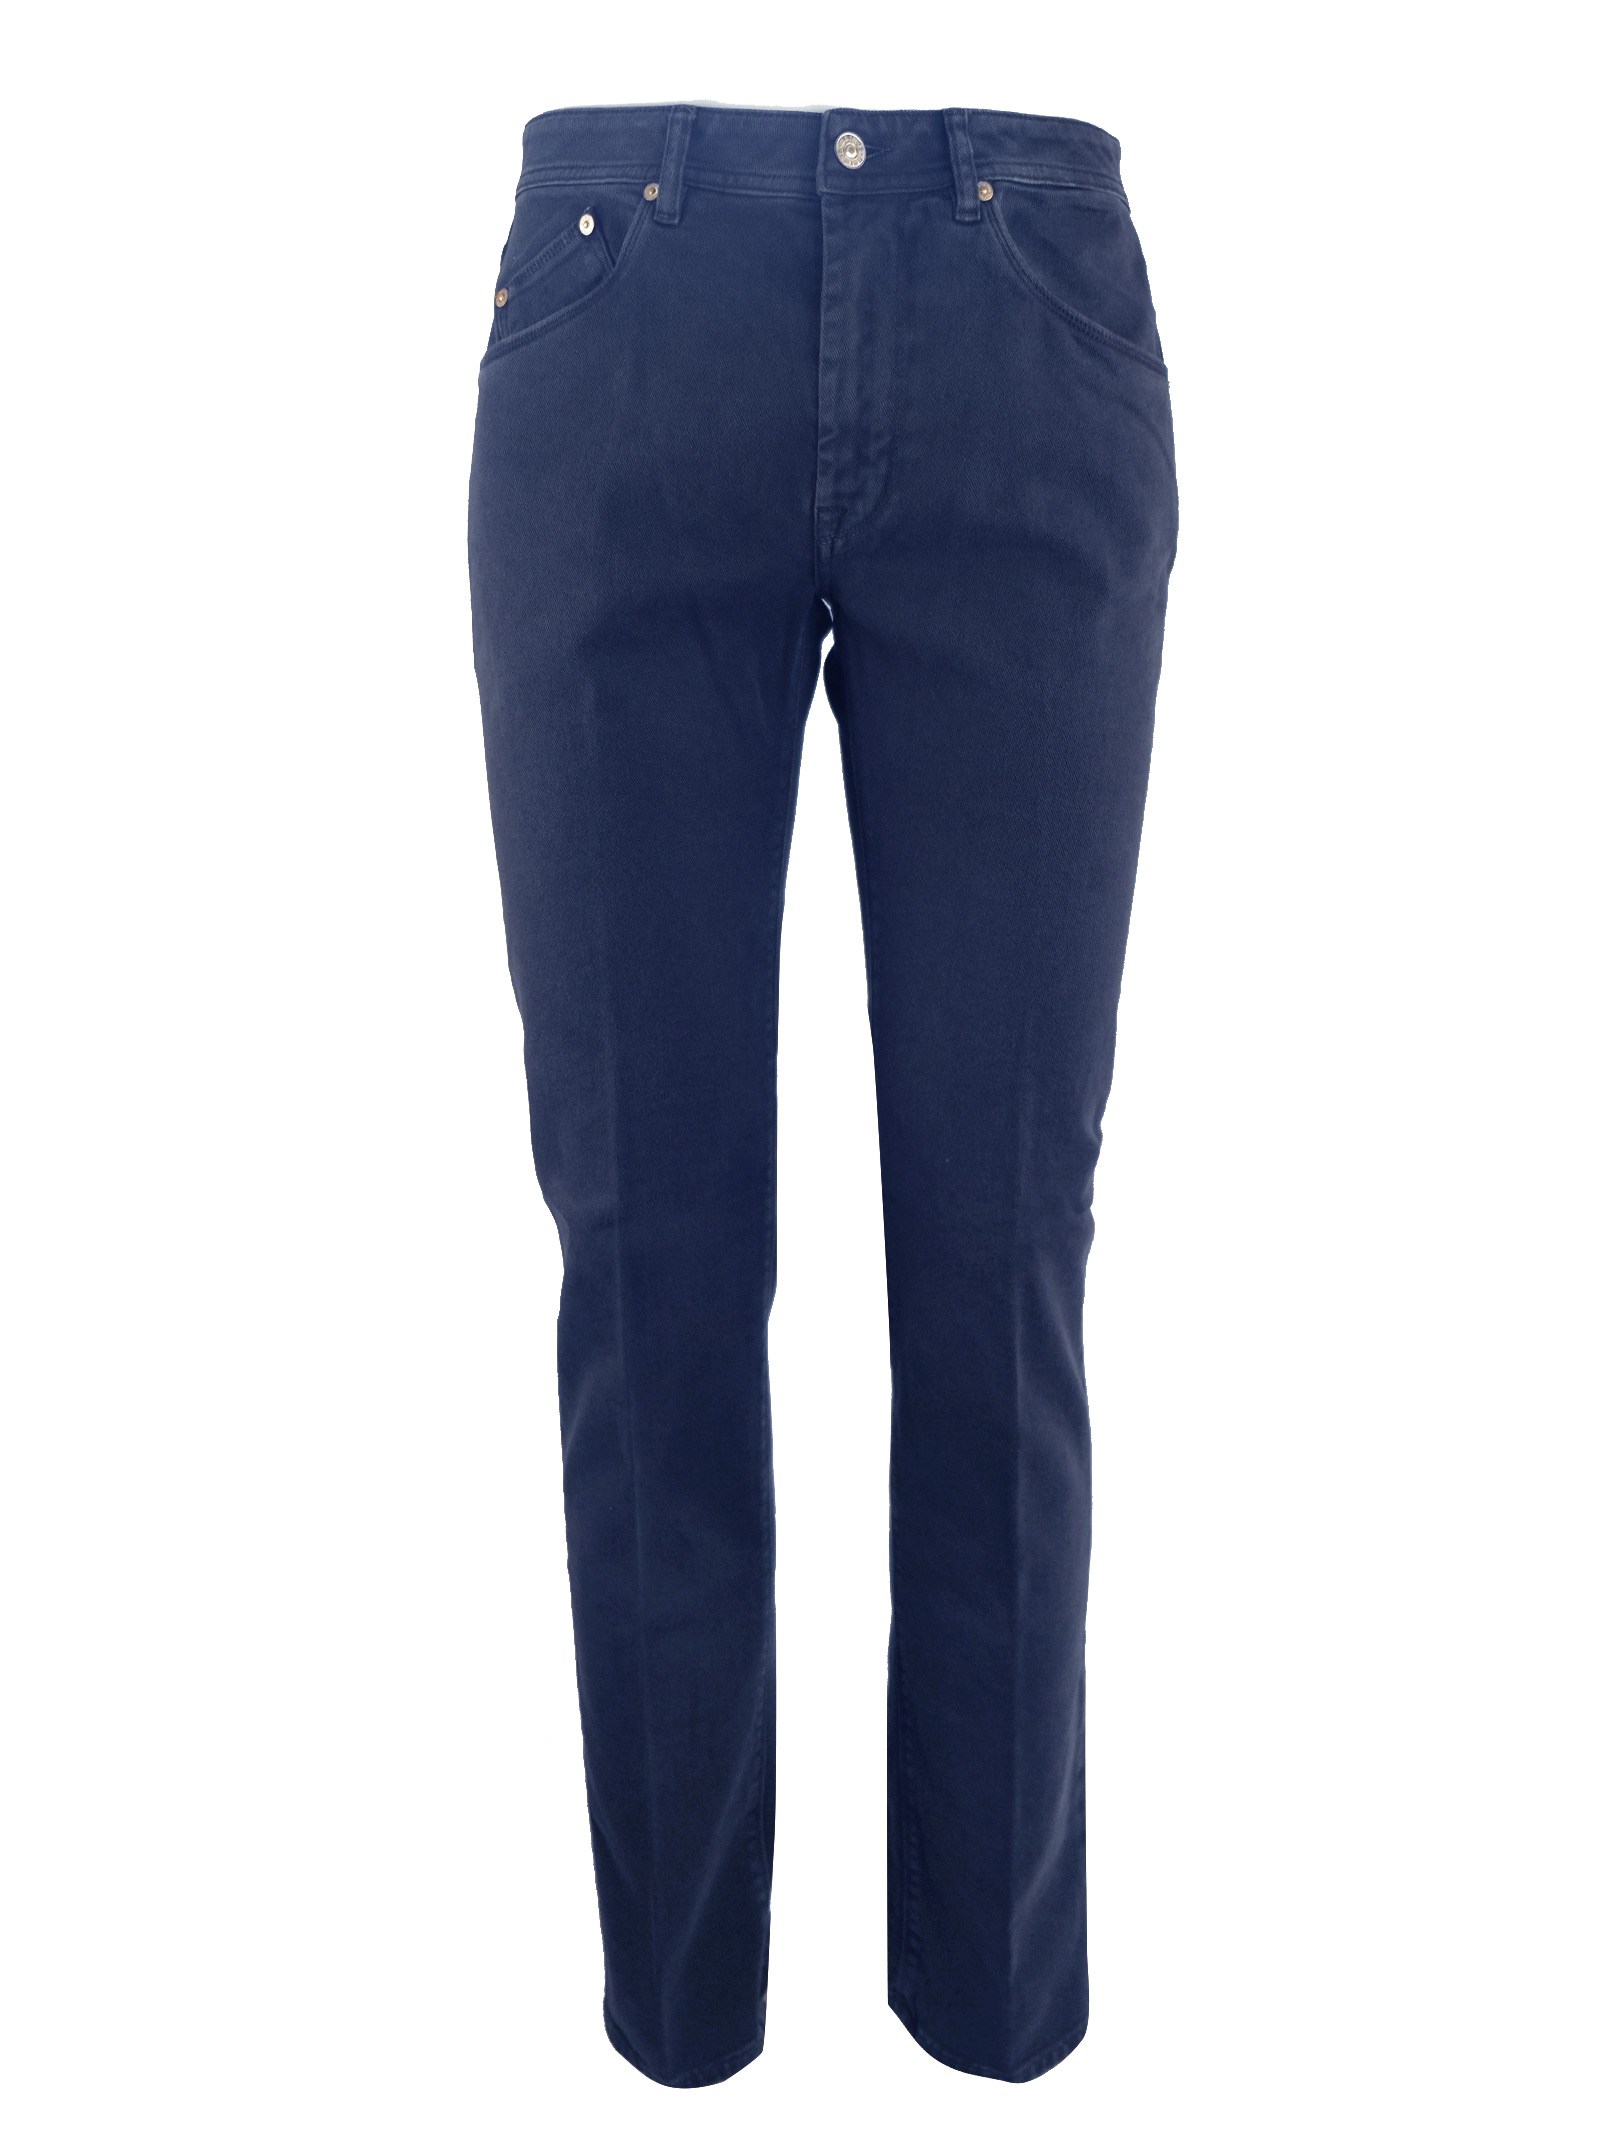 PANTALON 5 TASCHE IN BULL PIGMENTATO BARMAS | Jeans | DEAN B319 T03260